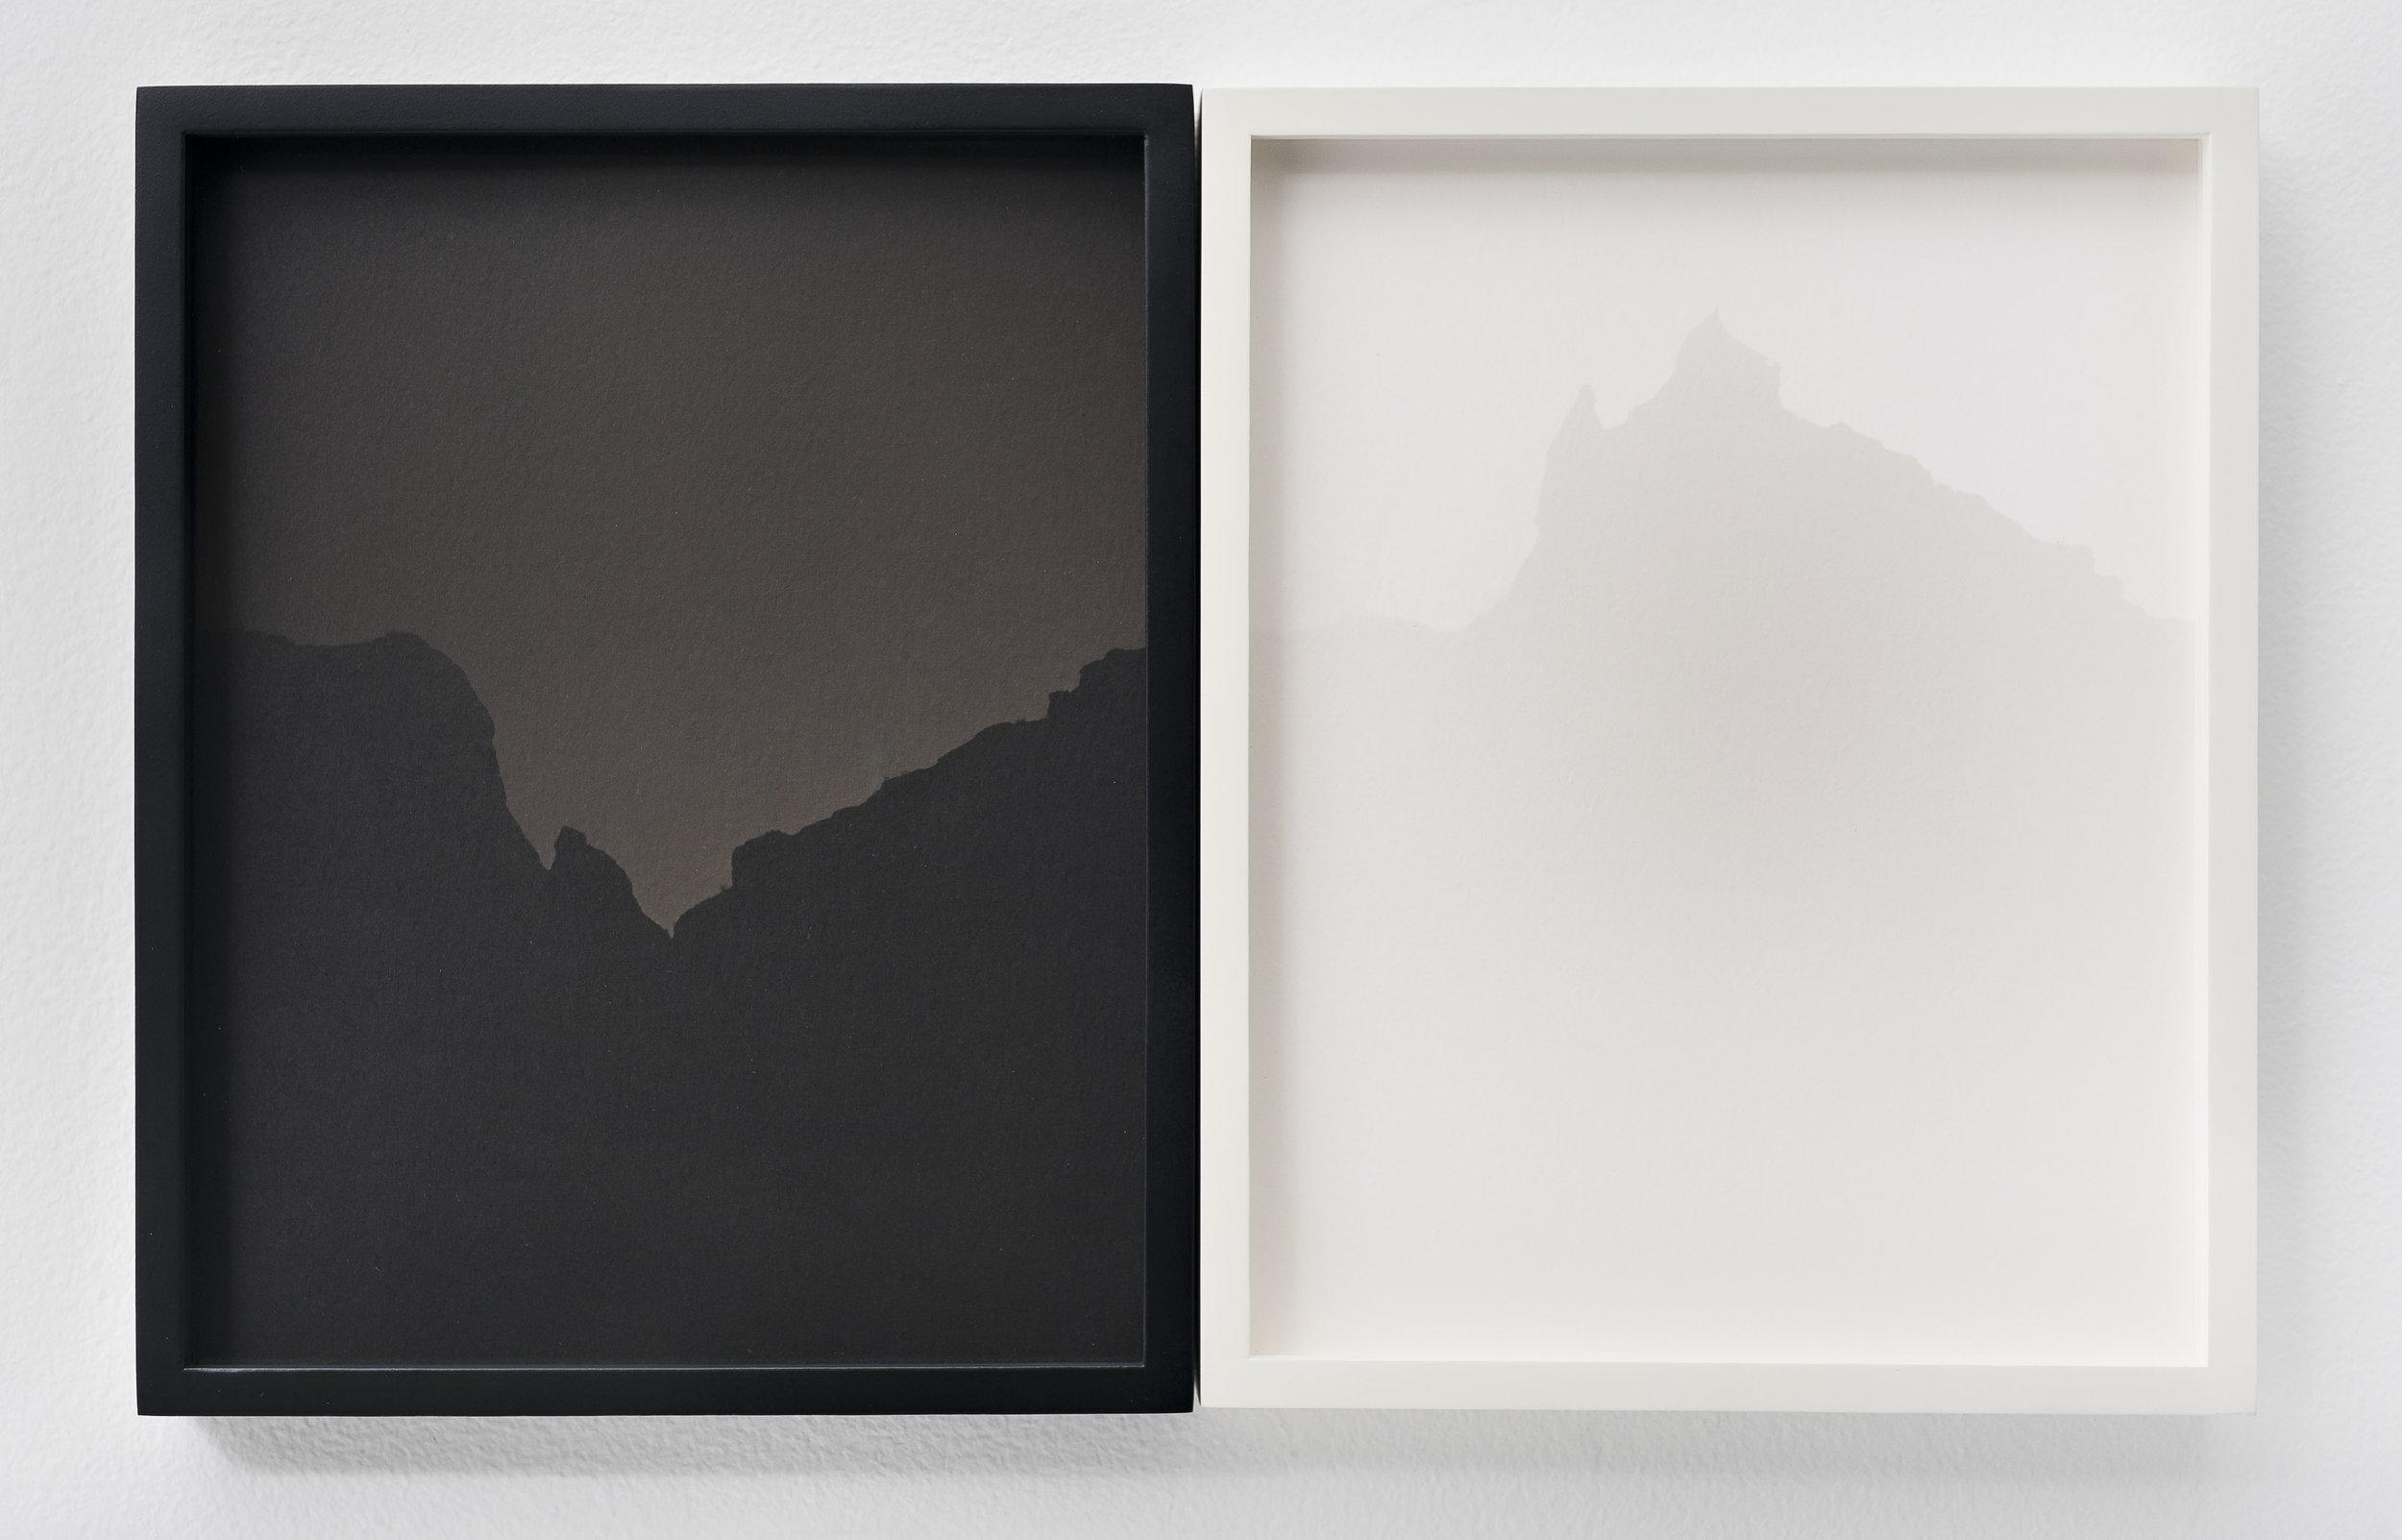 SCOTT B. DAVIS  Ridge Anza Borrego Desert,  2018 Unique paper negative palladium / platinum prints, diptych 10 x 16 in.